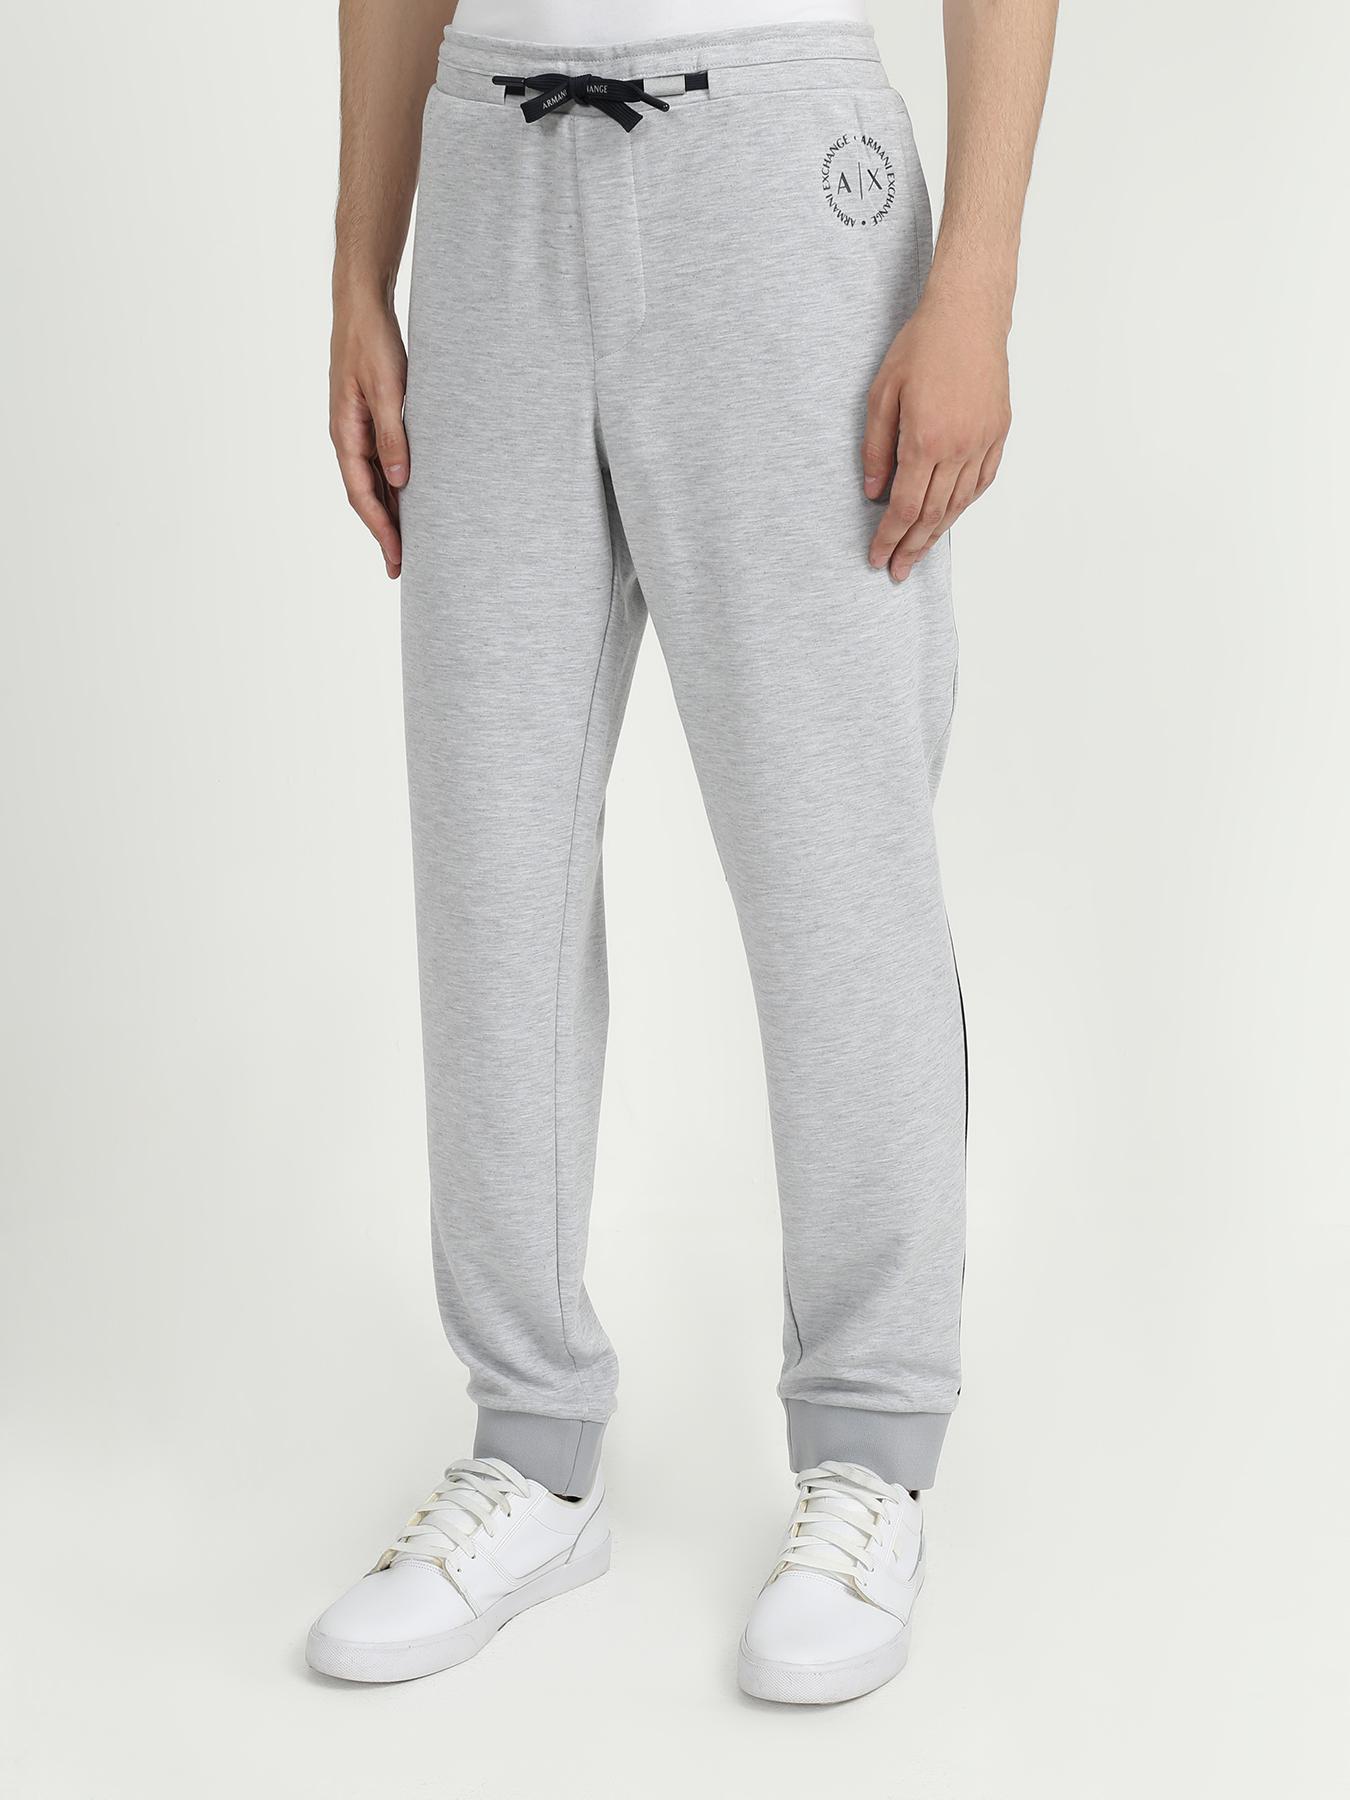 Спортивные брюки Armani Exchange Спортивные брюки